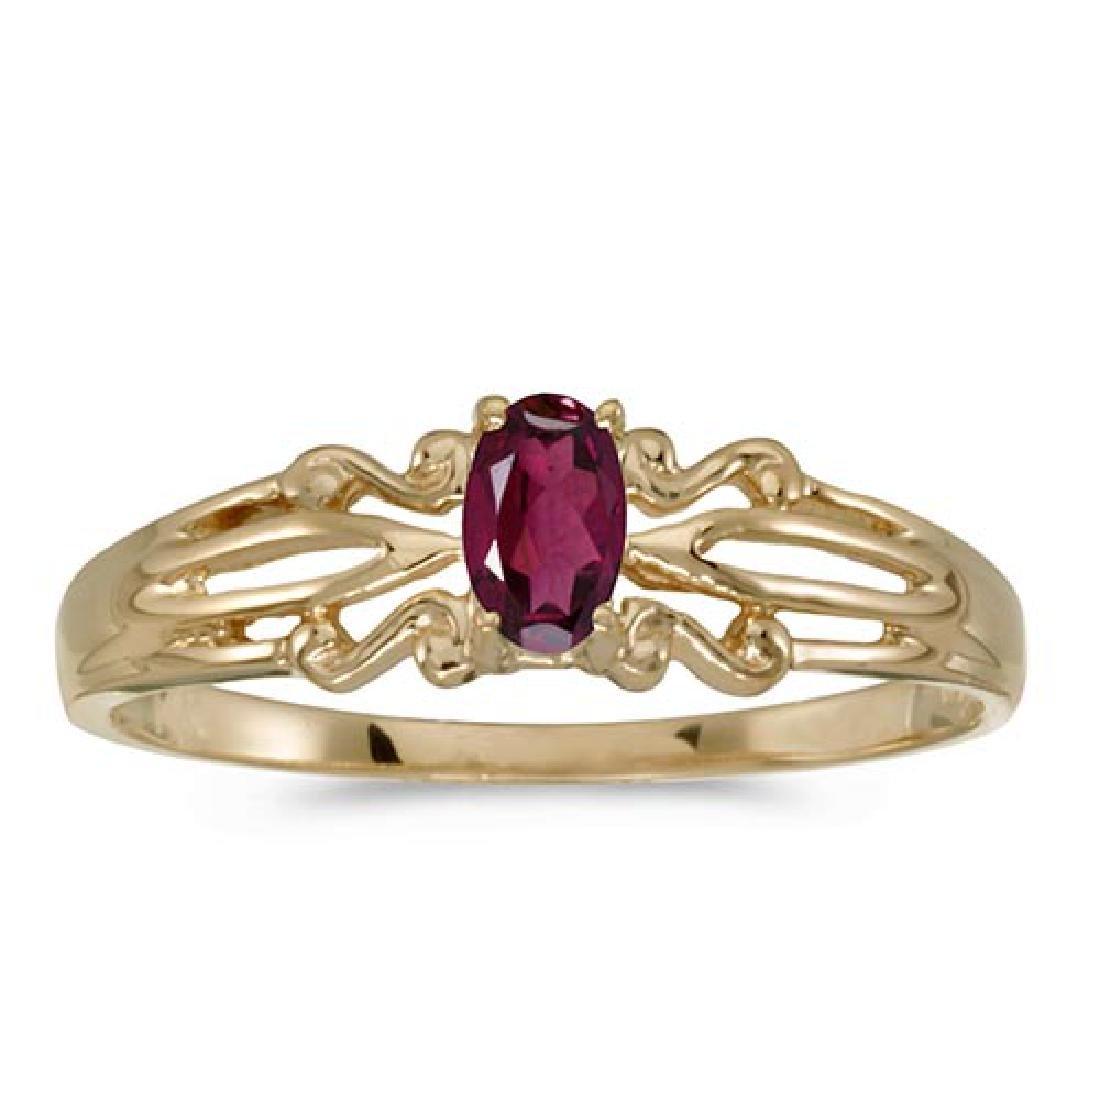 Certified 14k Yellow Gold Oval Rhodolite Garnet Ring